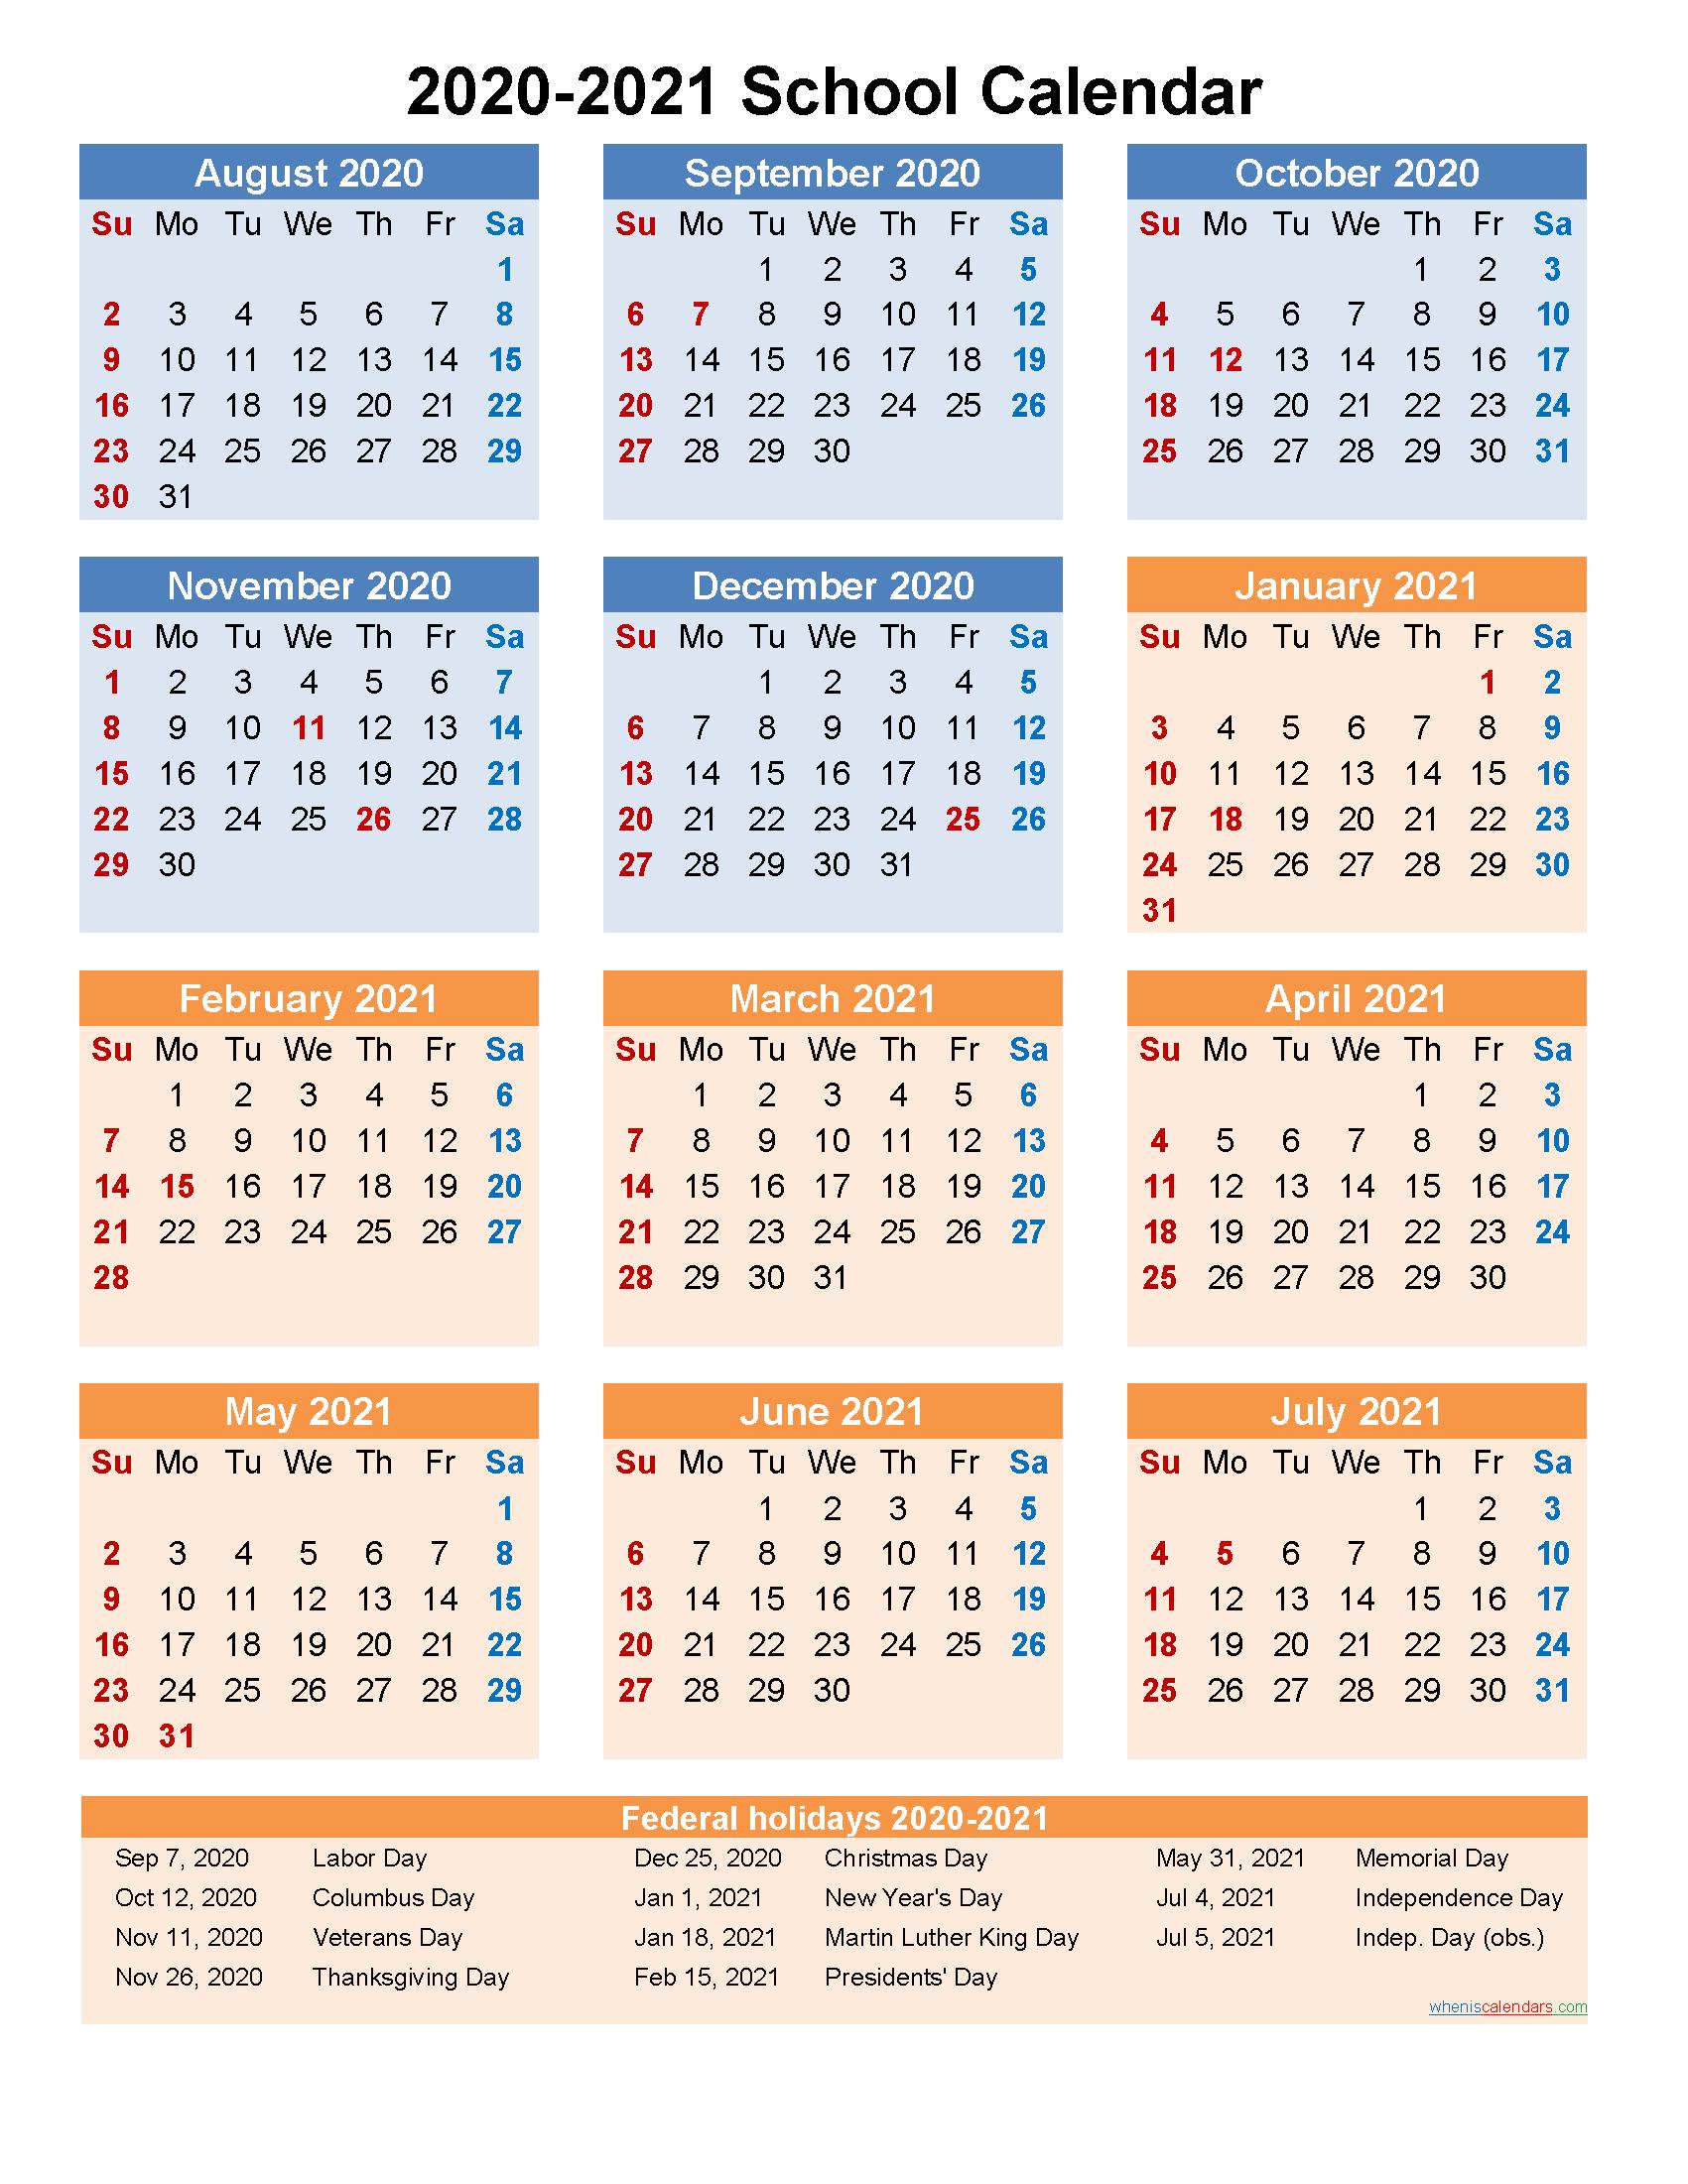 School Calendar 2020 And 2021 Printable (Portrait)  Template With Regard To Printable 2020 2021 School Calendar